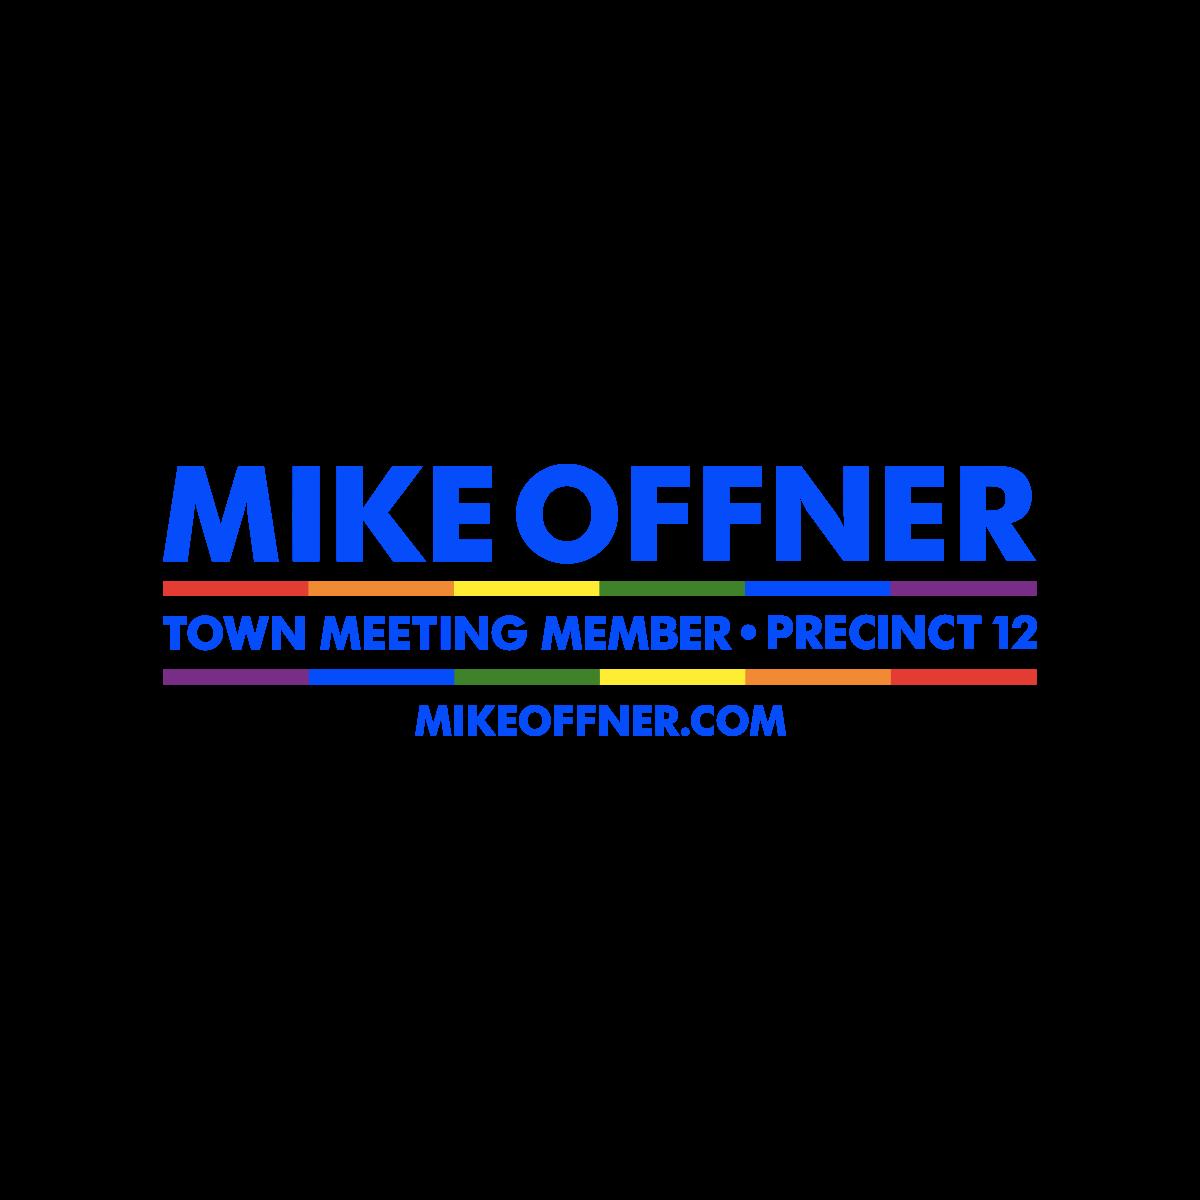 Mike Offner Town Meeting Member • Precinct 12